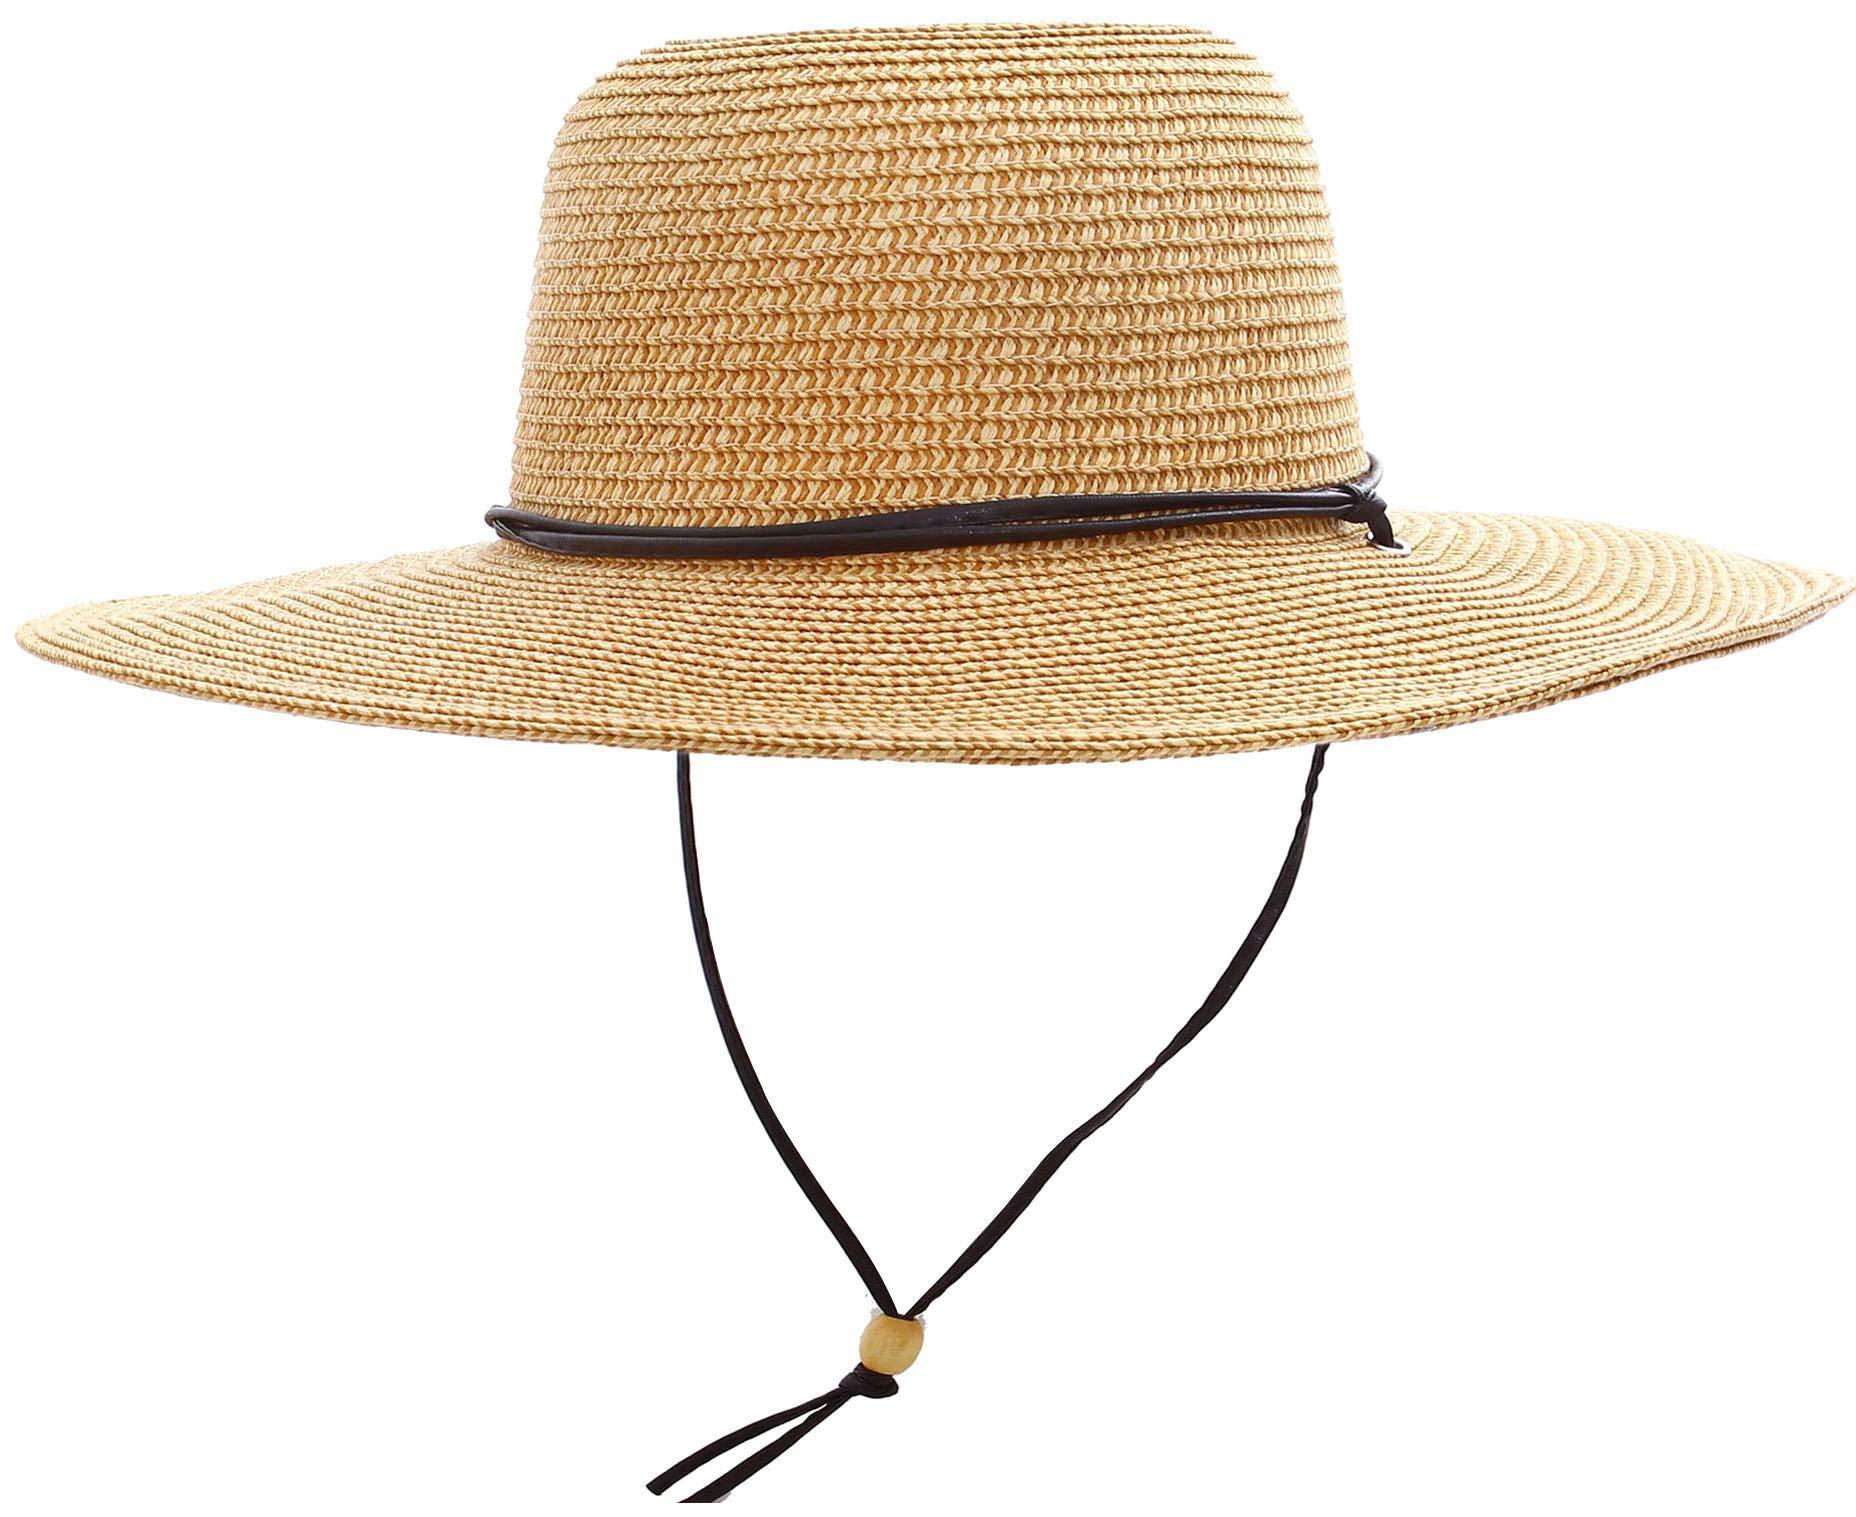 Women's UPF 50+ Wide Brim Braided Straw Sun Hat with Lanyard Natural-Brown